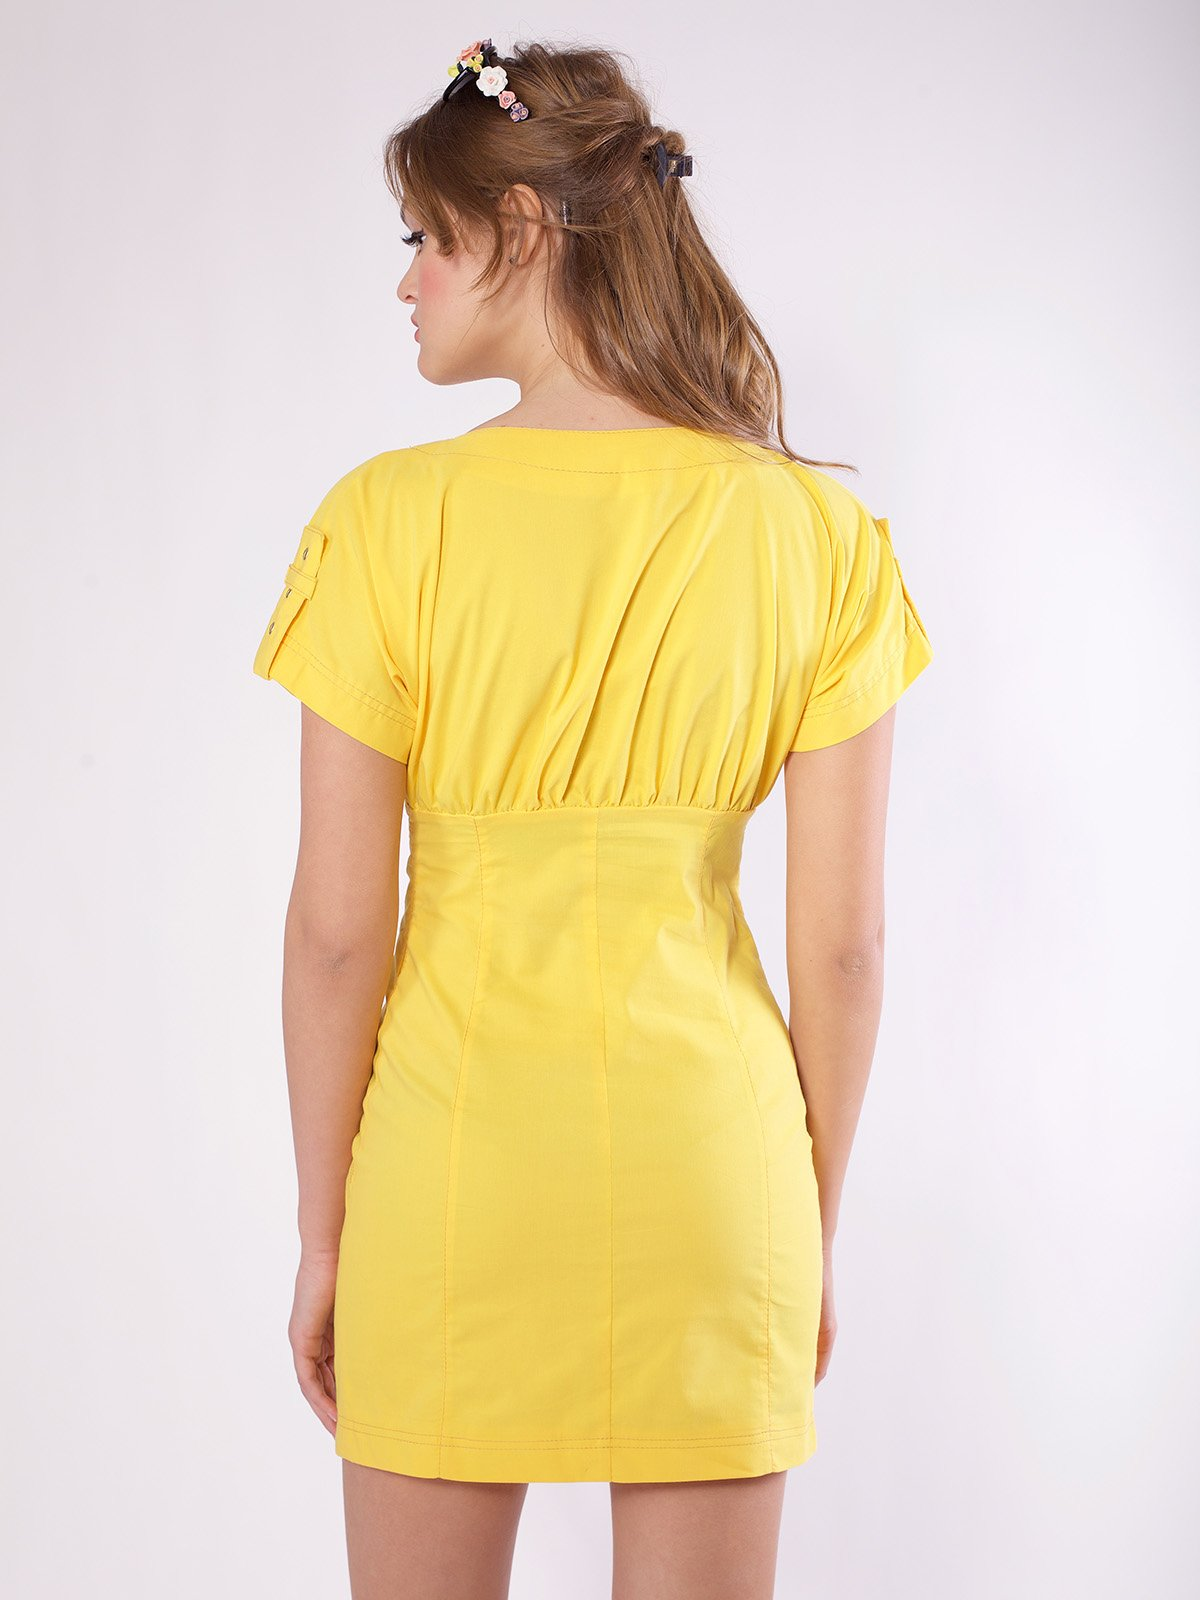 Сукня жовта   2386024   фото 3